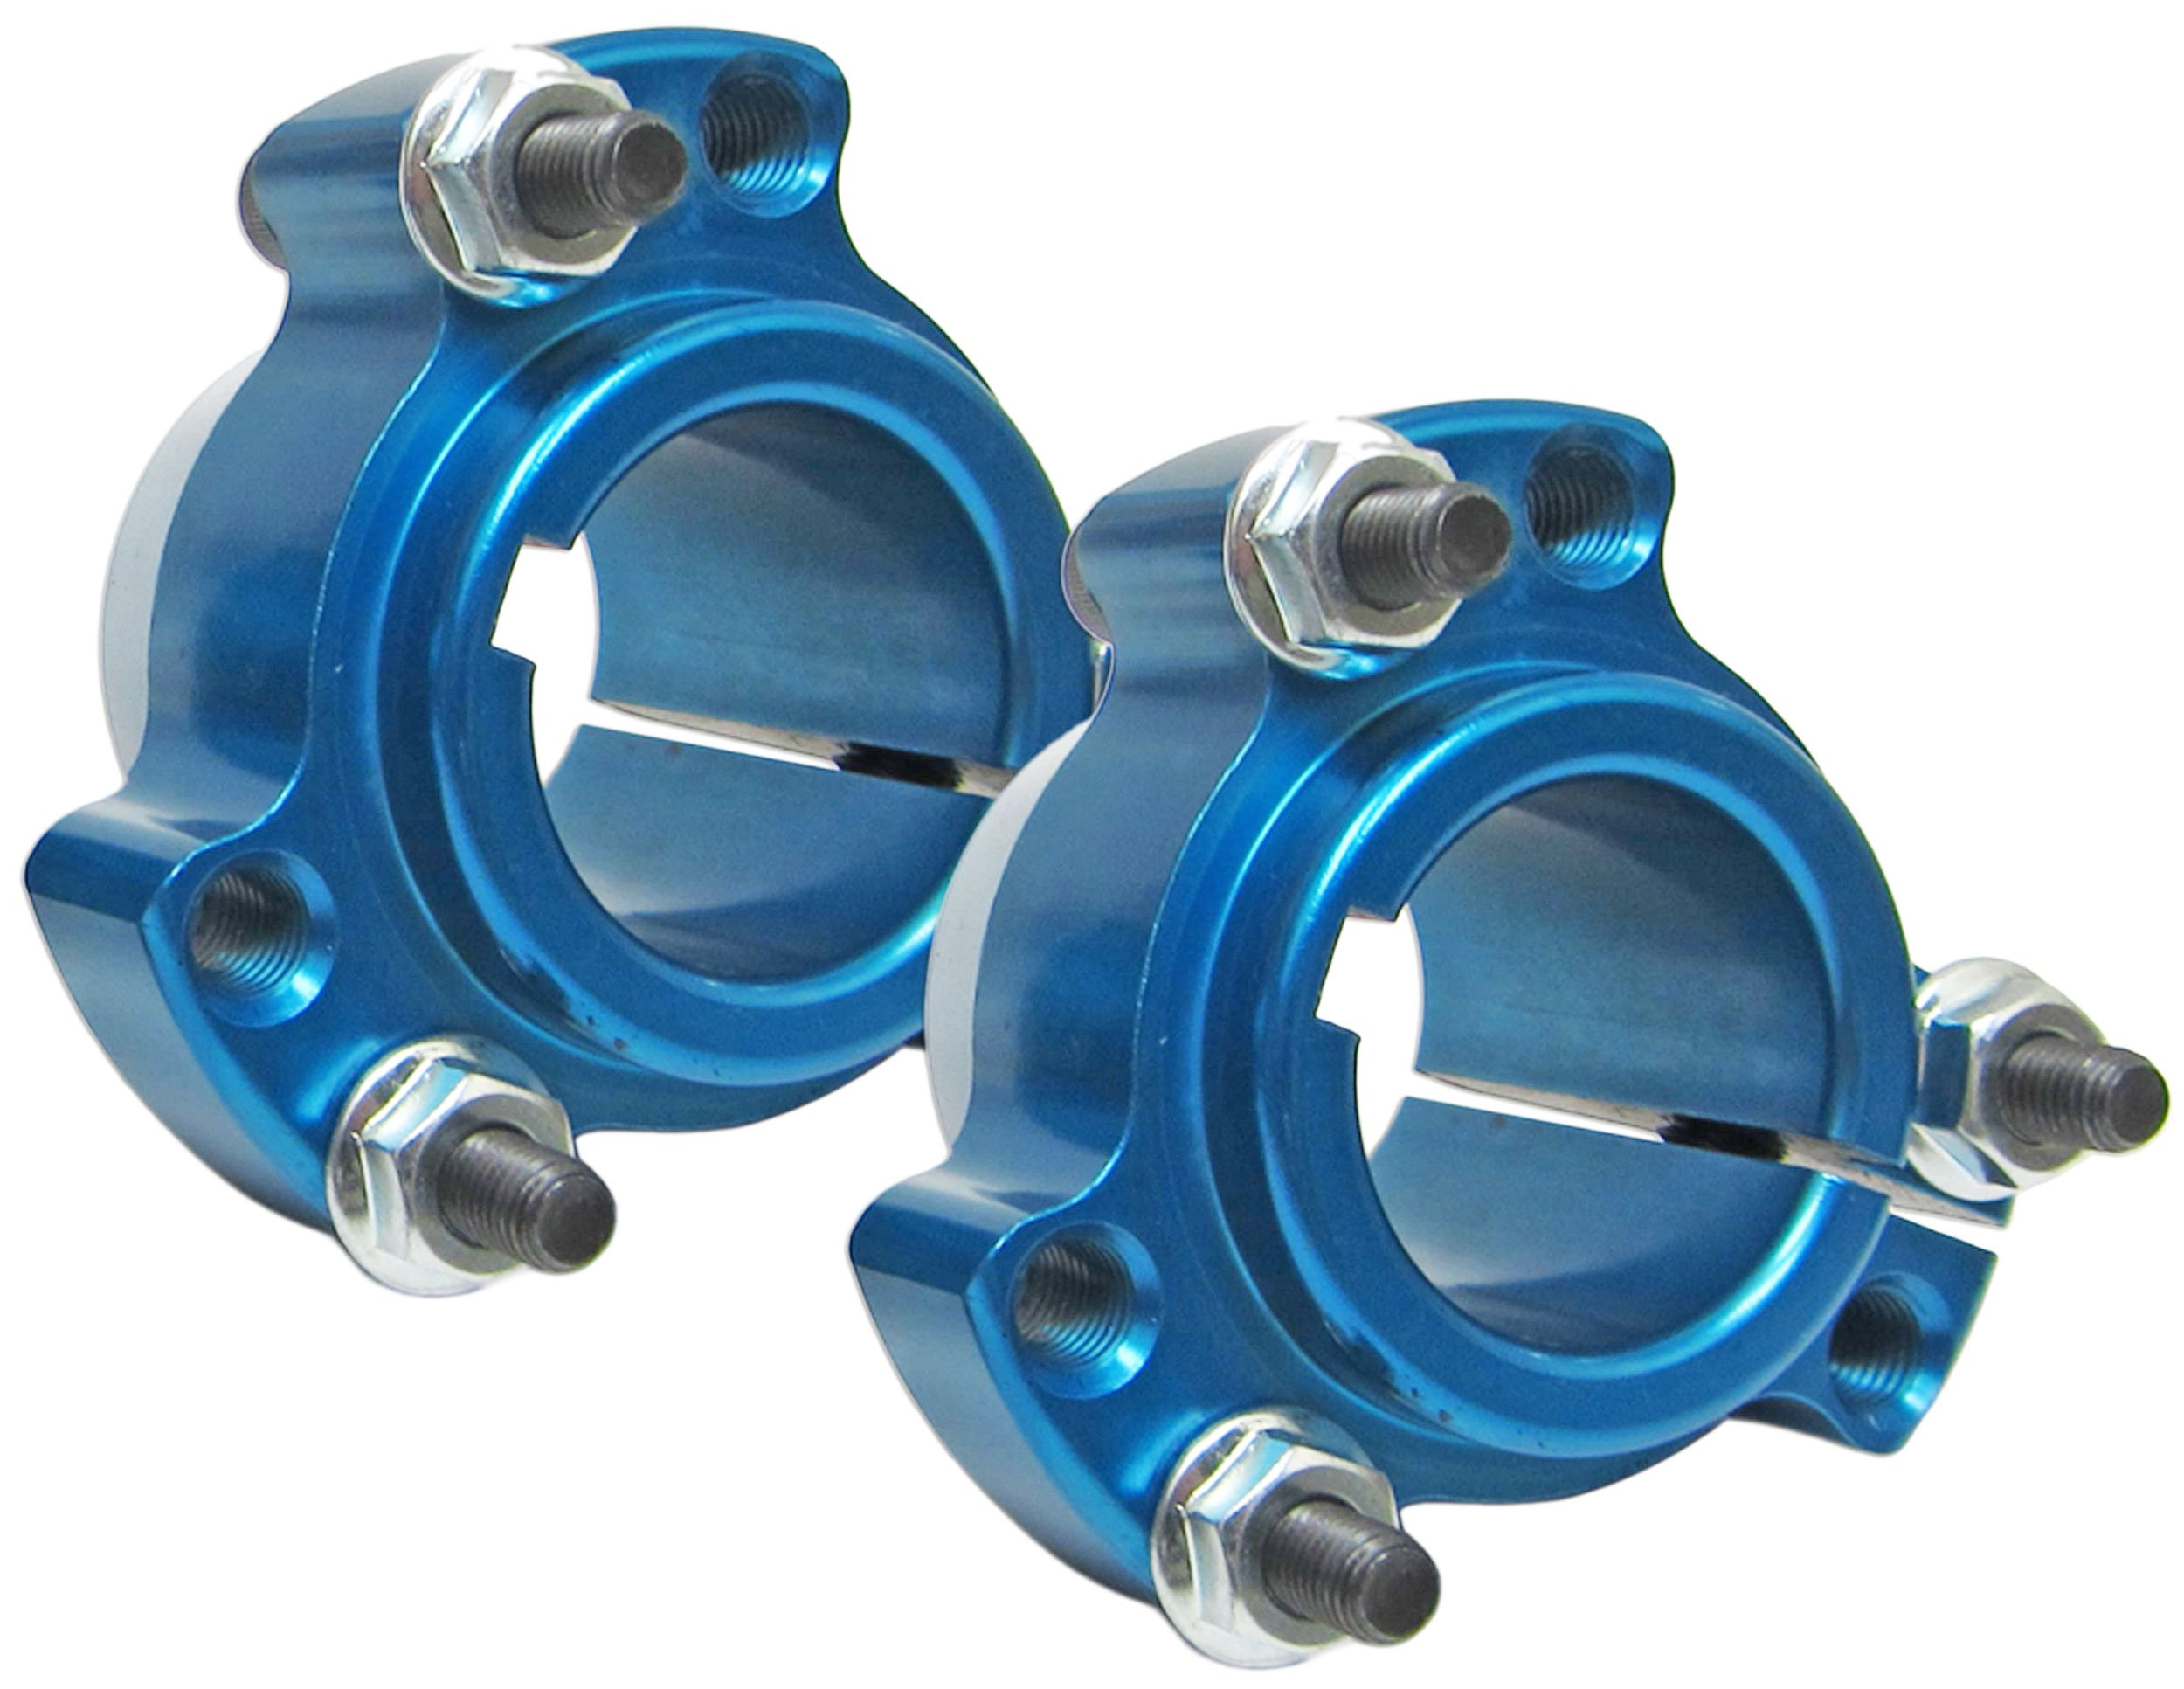 Set of 2 - Blue 1'' Rear Lightened Aluminum Racing Wheel Hubs Go Karts Drift Trikes